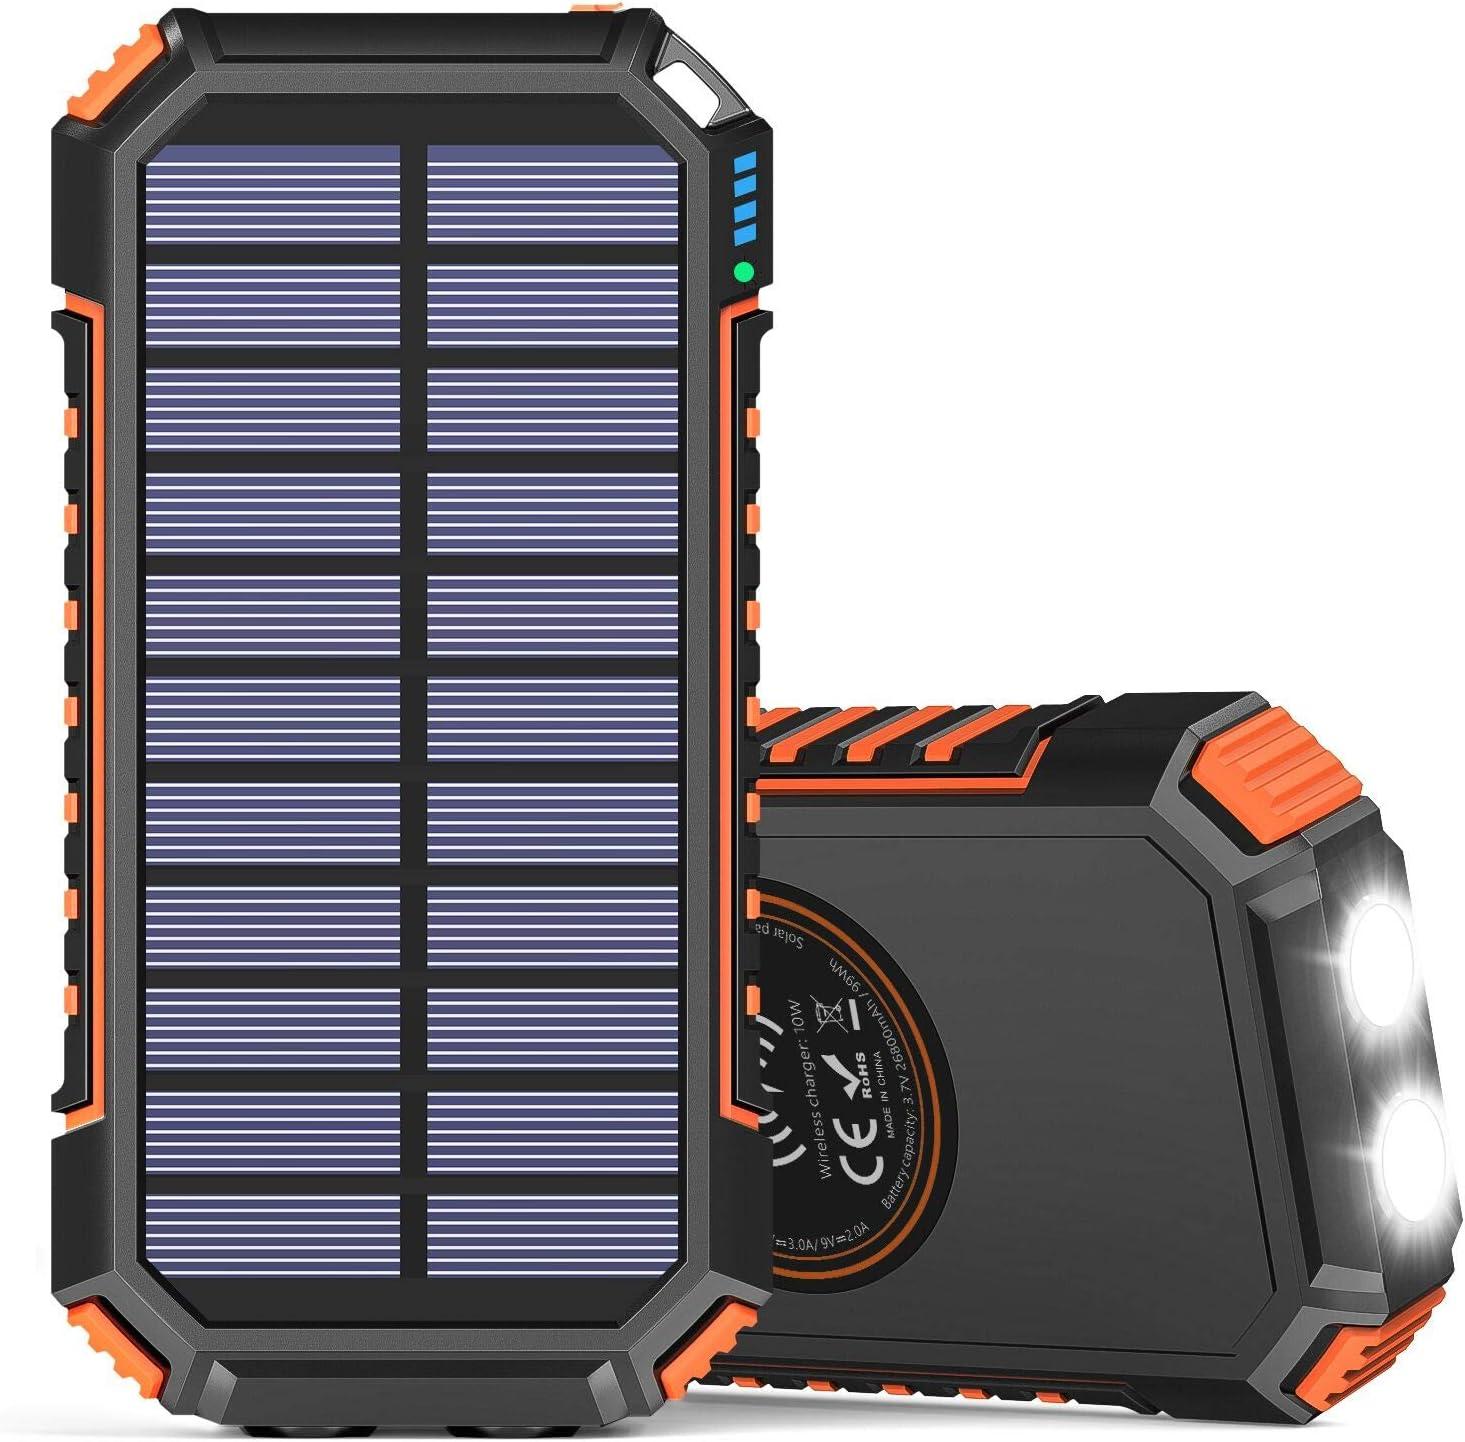 Solar Charger Power Bank 26800mAh, Hiluckey Wireless QC Orange